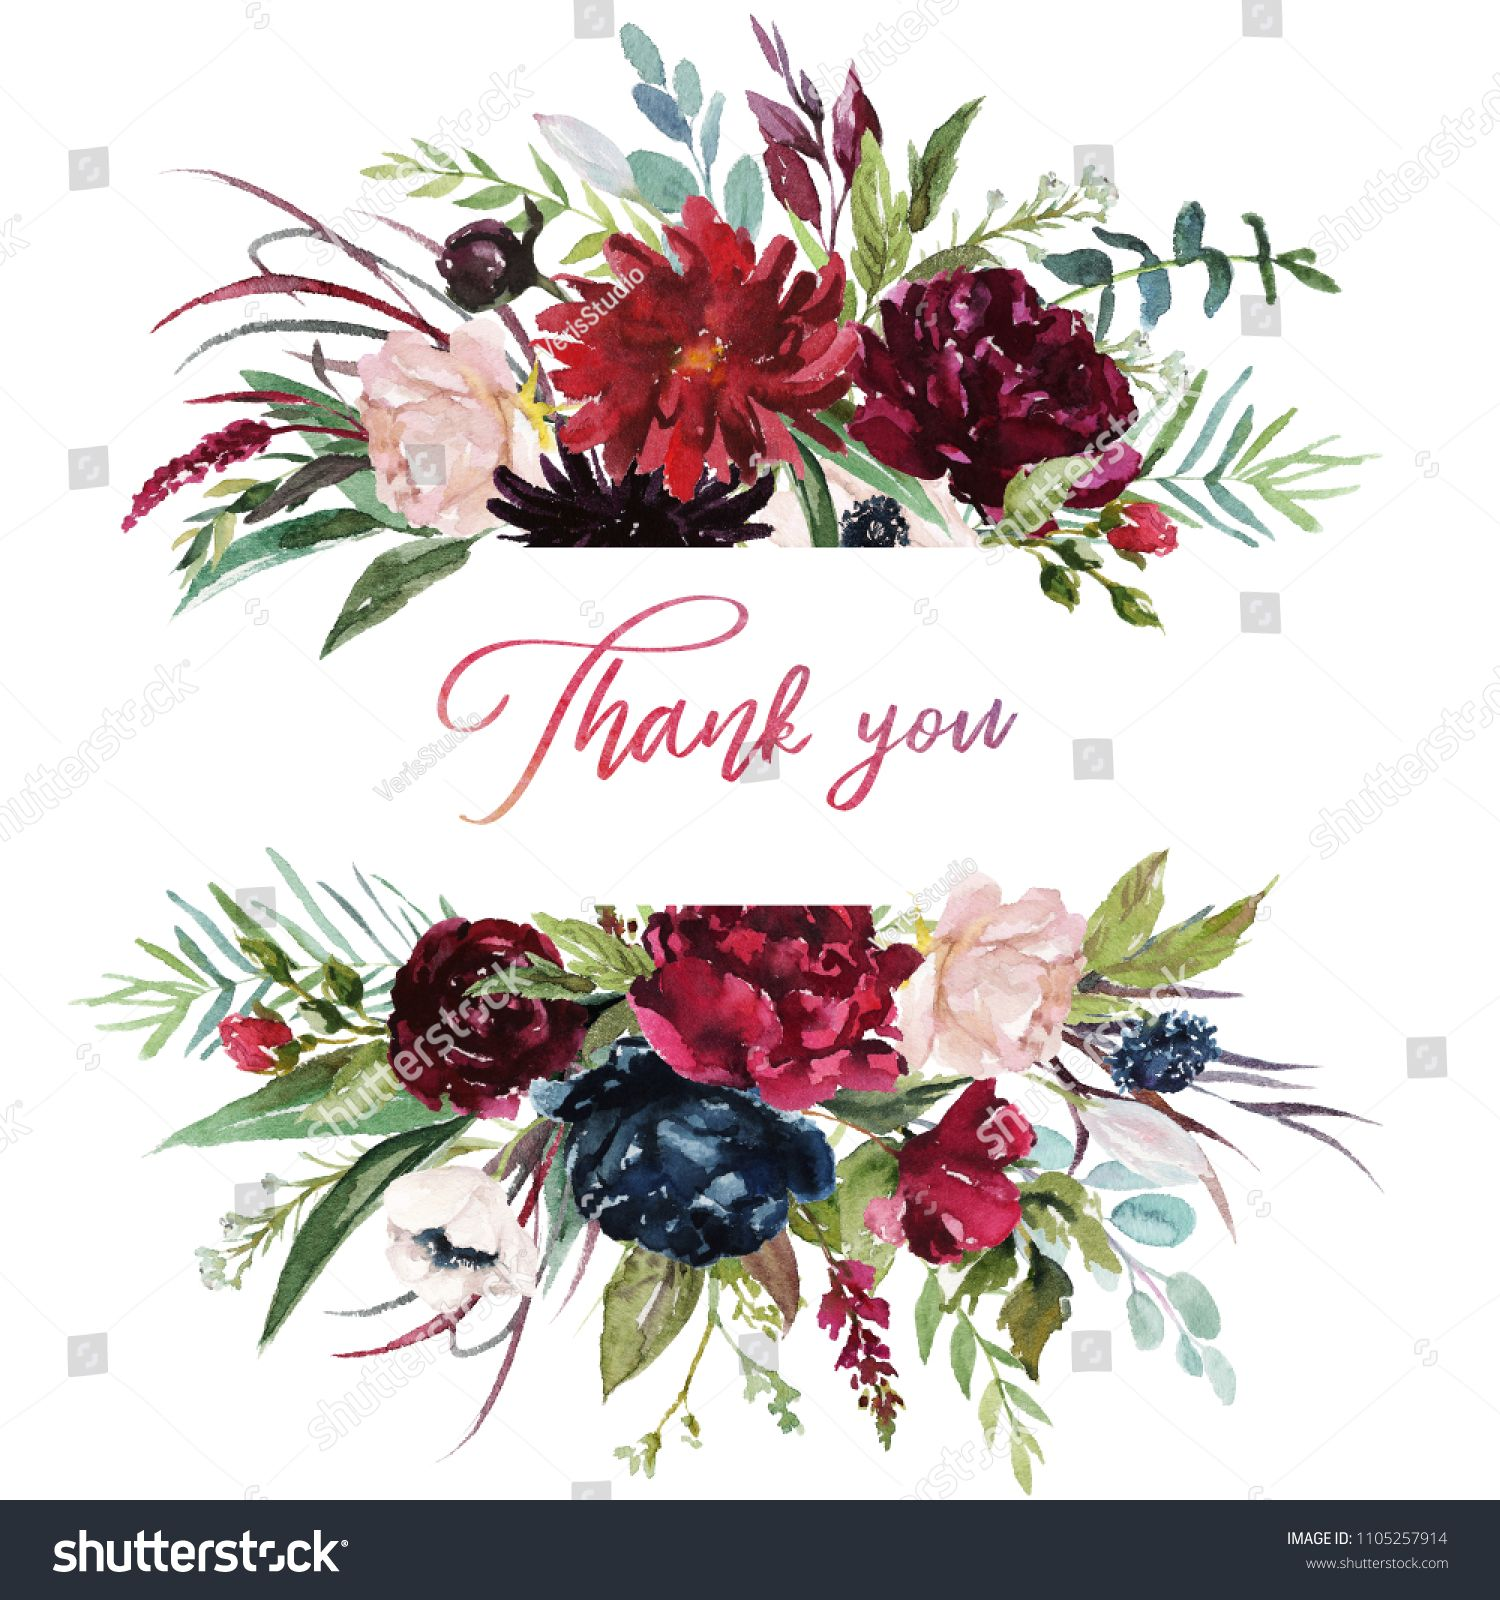 Watercolor floral illustration burgundy flowers border